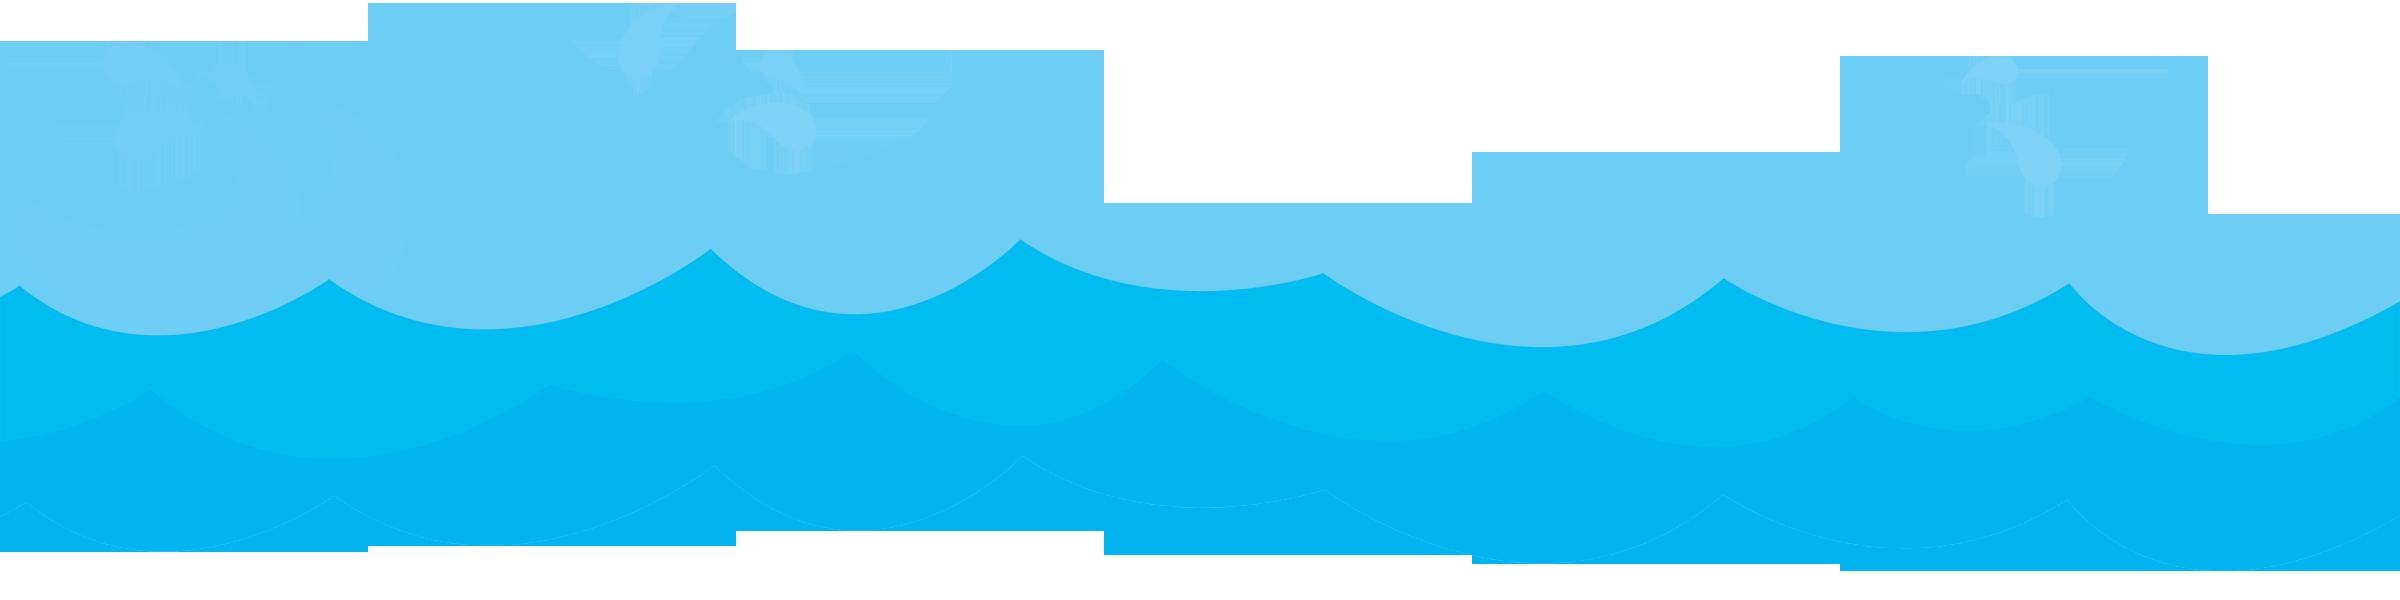 Waves clipart pool wave. Wind ocean clip art